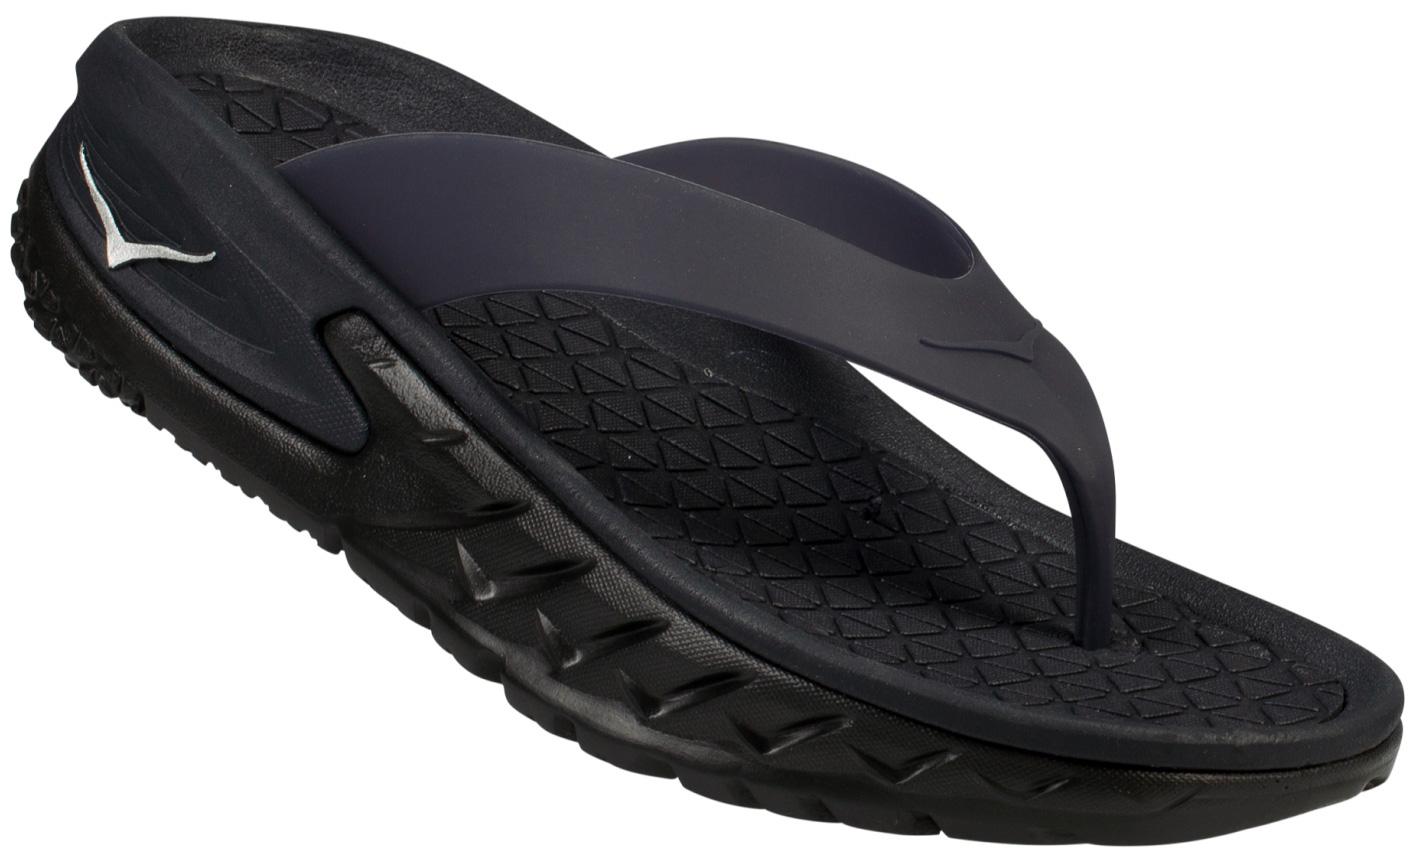 c2b726631204 Hoka One One Ora Recovery Flip Sandal - Women s 1018353-BLK-05